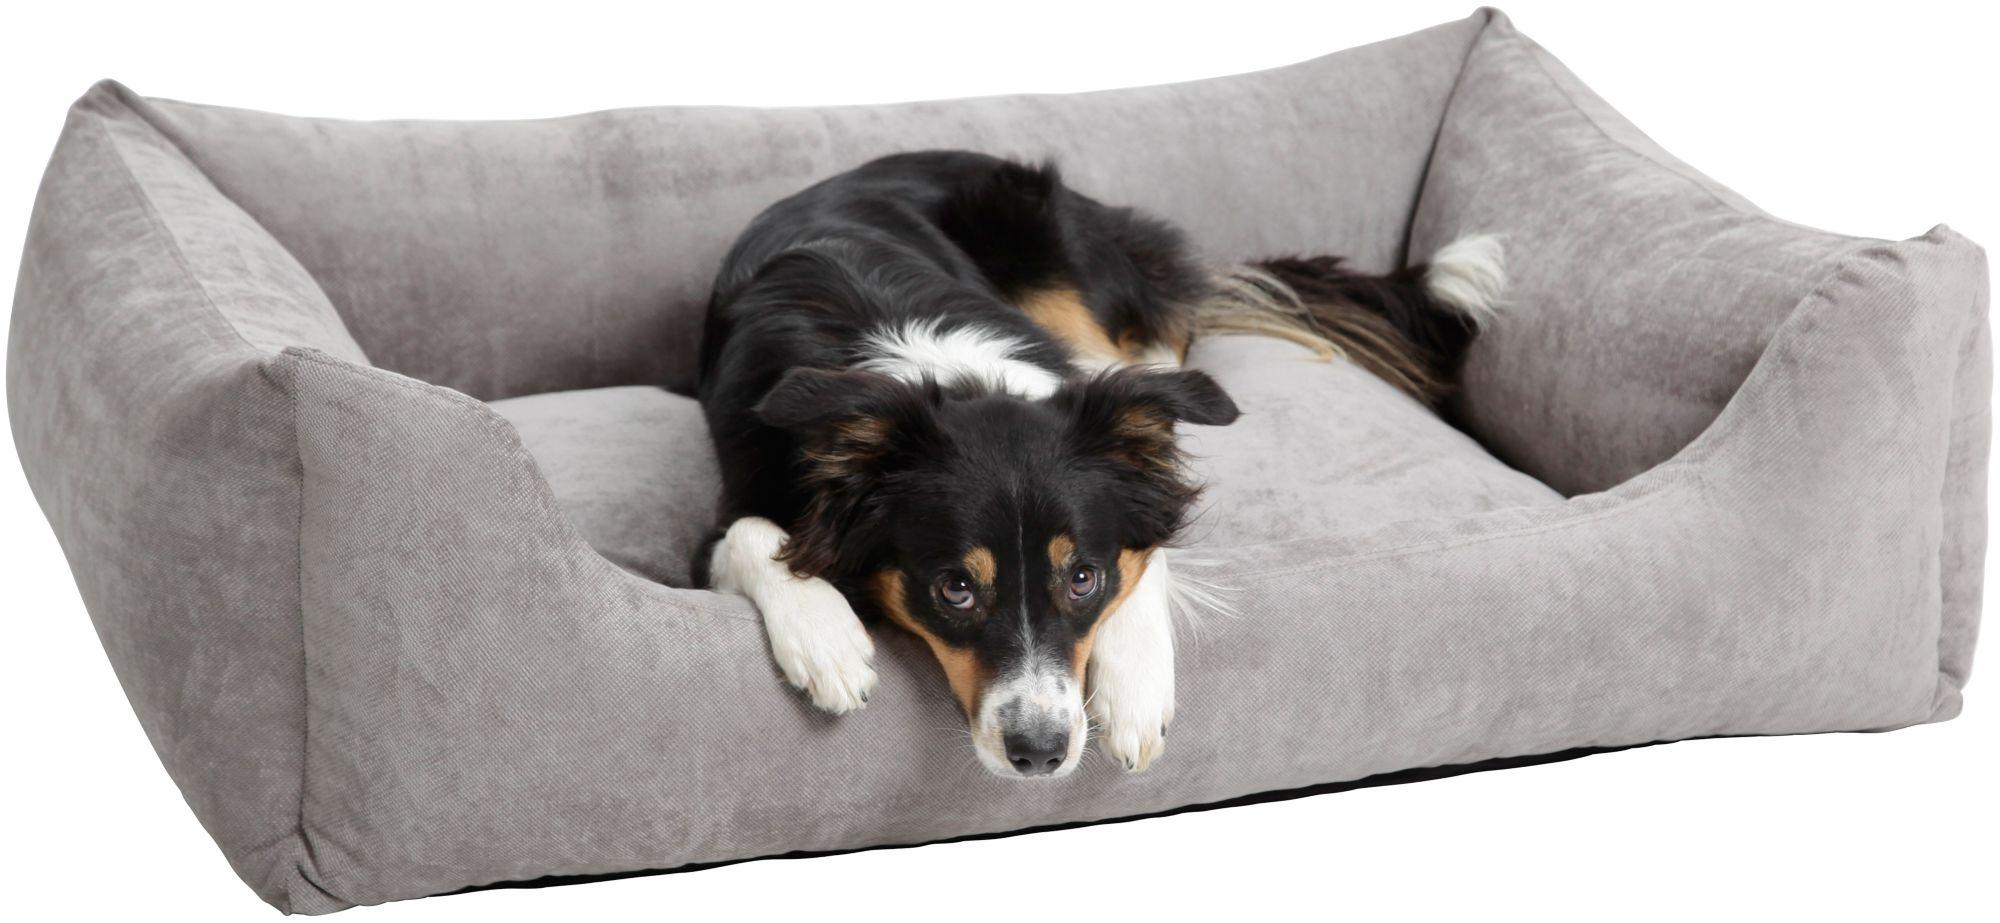 DOGS IN THE CITY Hundebett und Katzenbett »Madison«, B/T/H: 60/40/25 cm, Grau